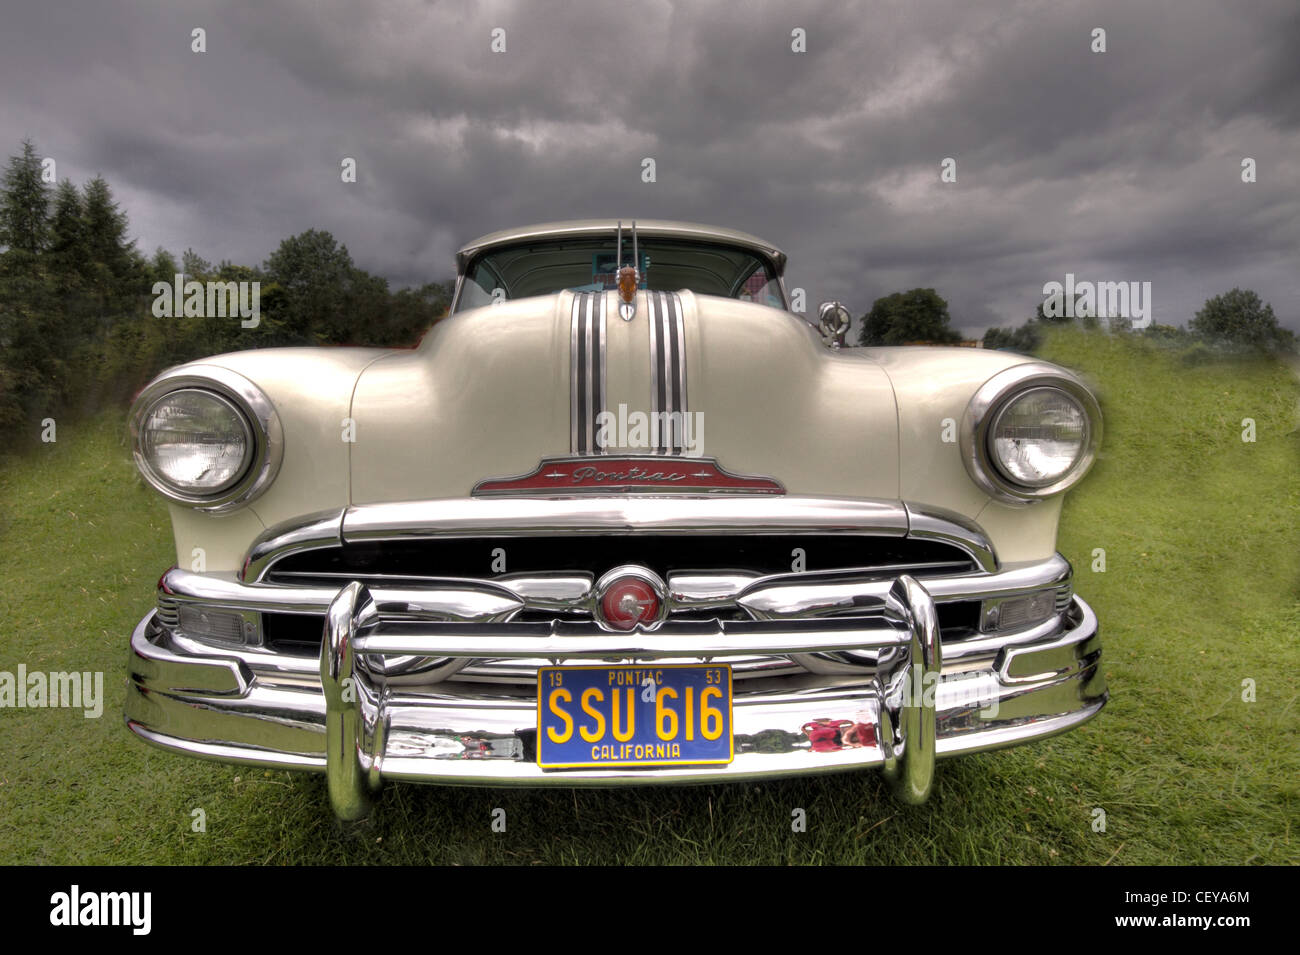 White,Pontiac,American,Classic,Car,/,Automobile,SSU616,SSU,616,1953,Pontiac,Custom,Catalina,Coupe,8,eight,cylinders,cyl,cylinder,gotonysmith,Style,#,2537SD,#2537SD,SSU 616,gotonysmith,Buy Pictures of,Buy Images Of